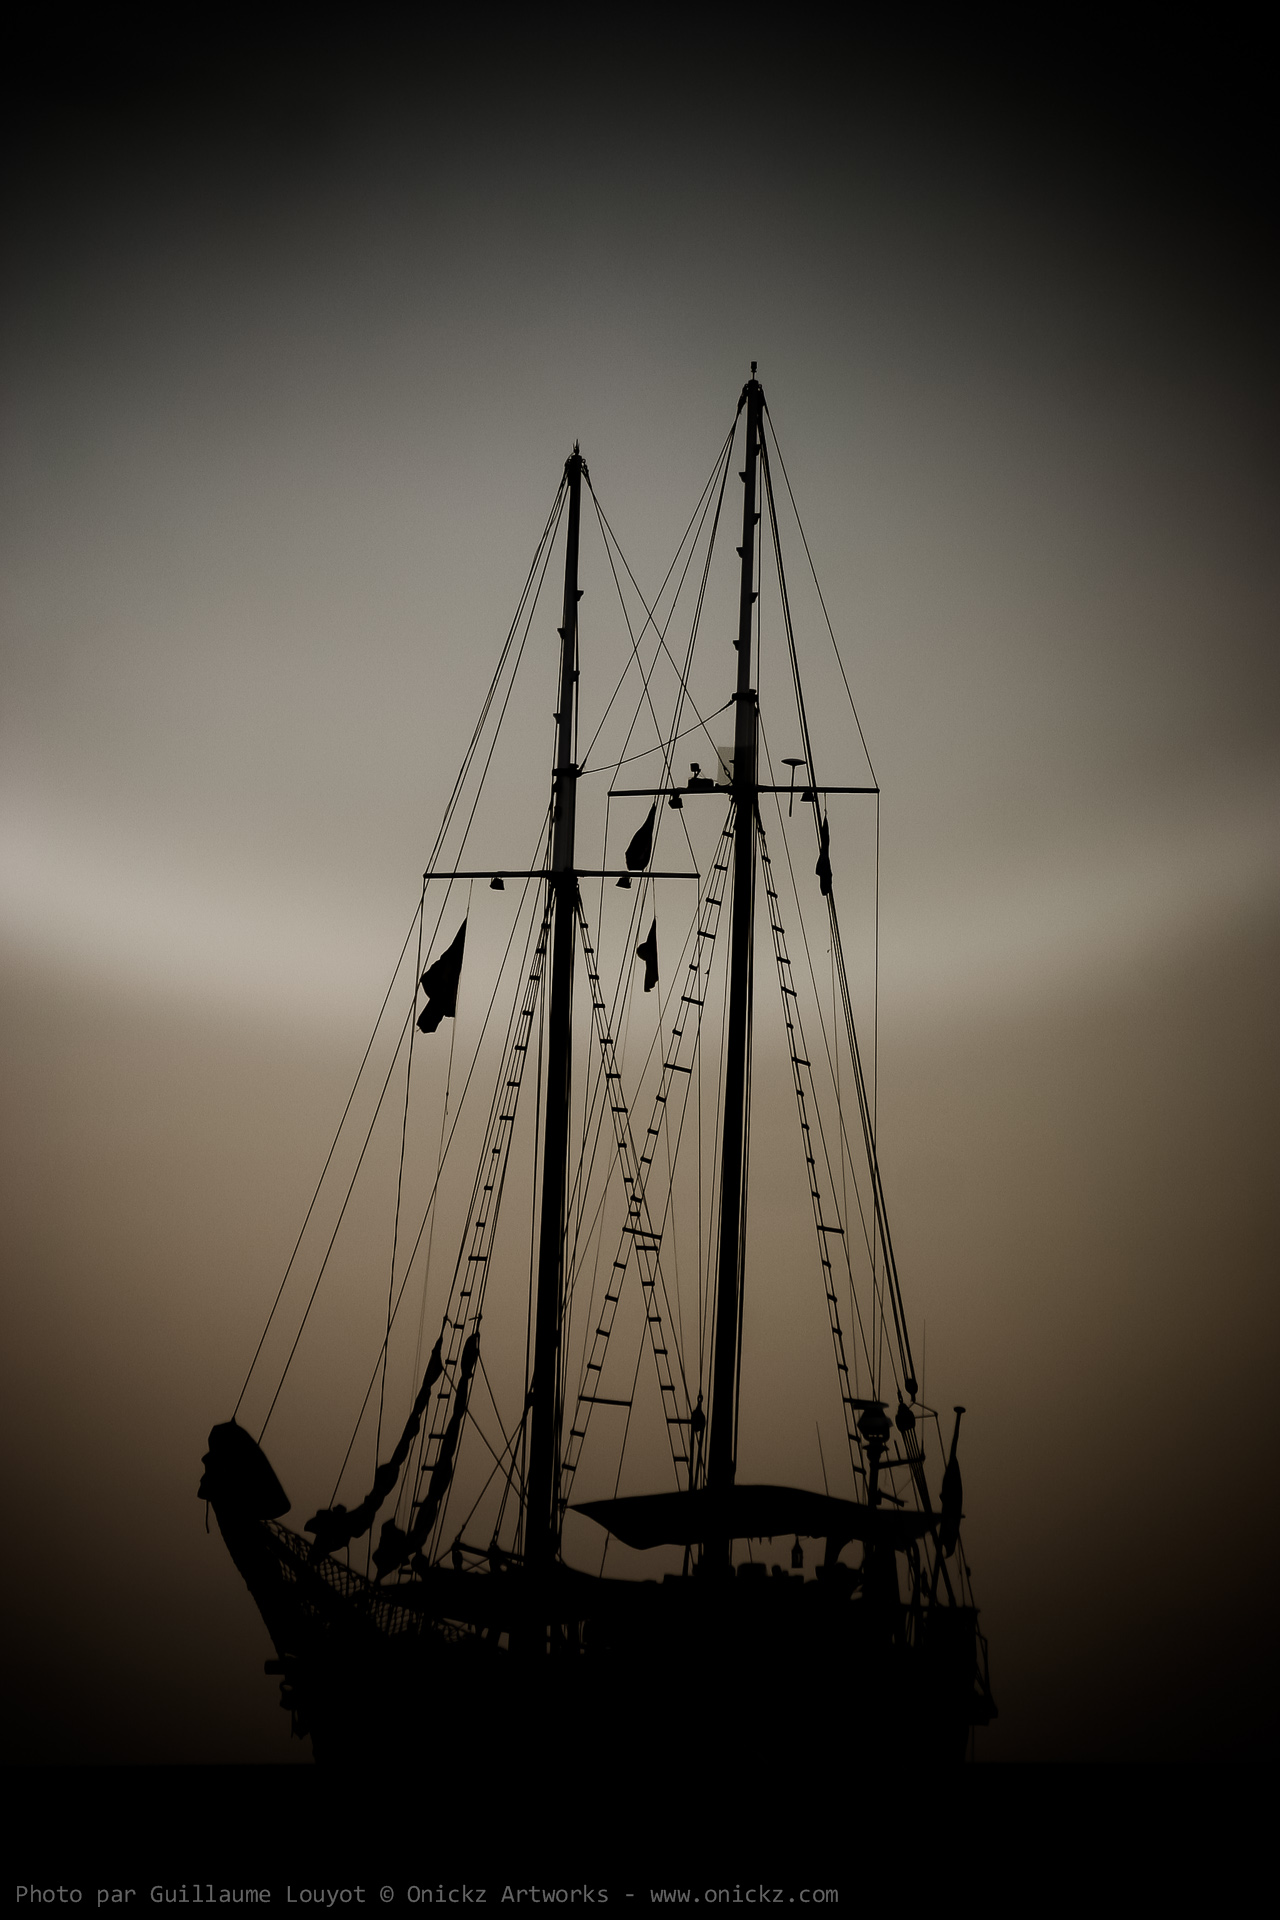 Sicilian Dark Boat